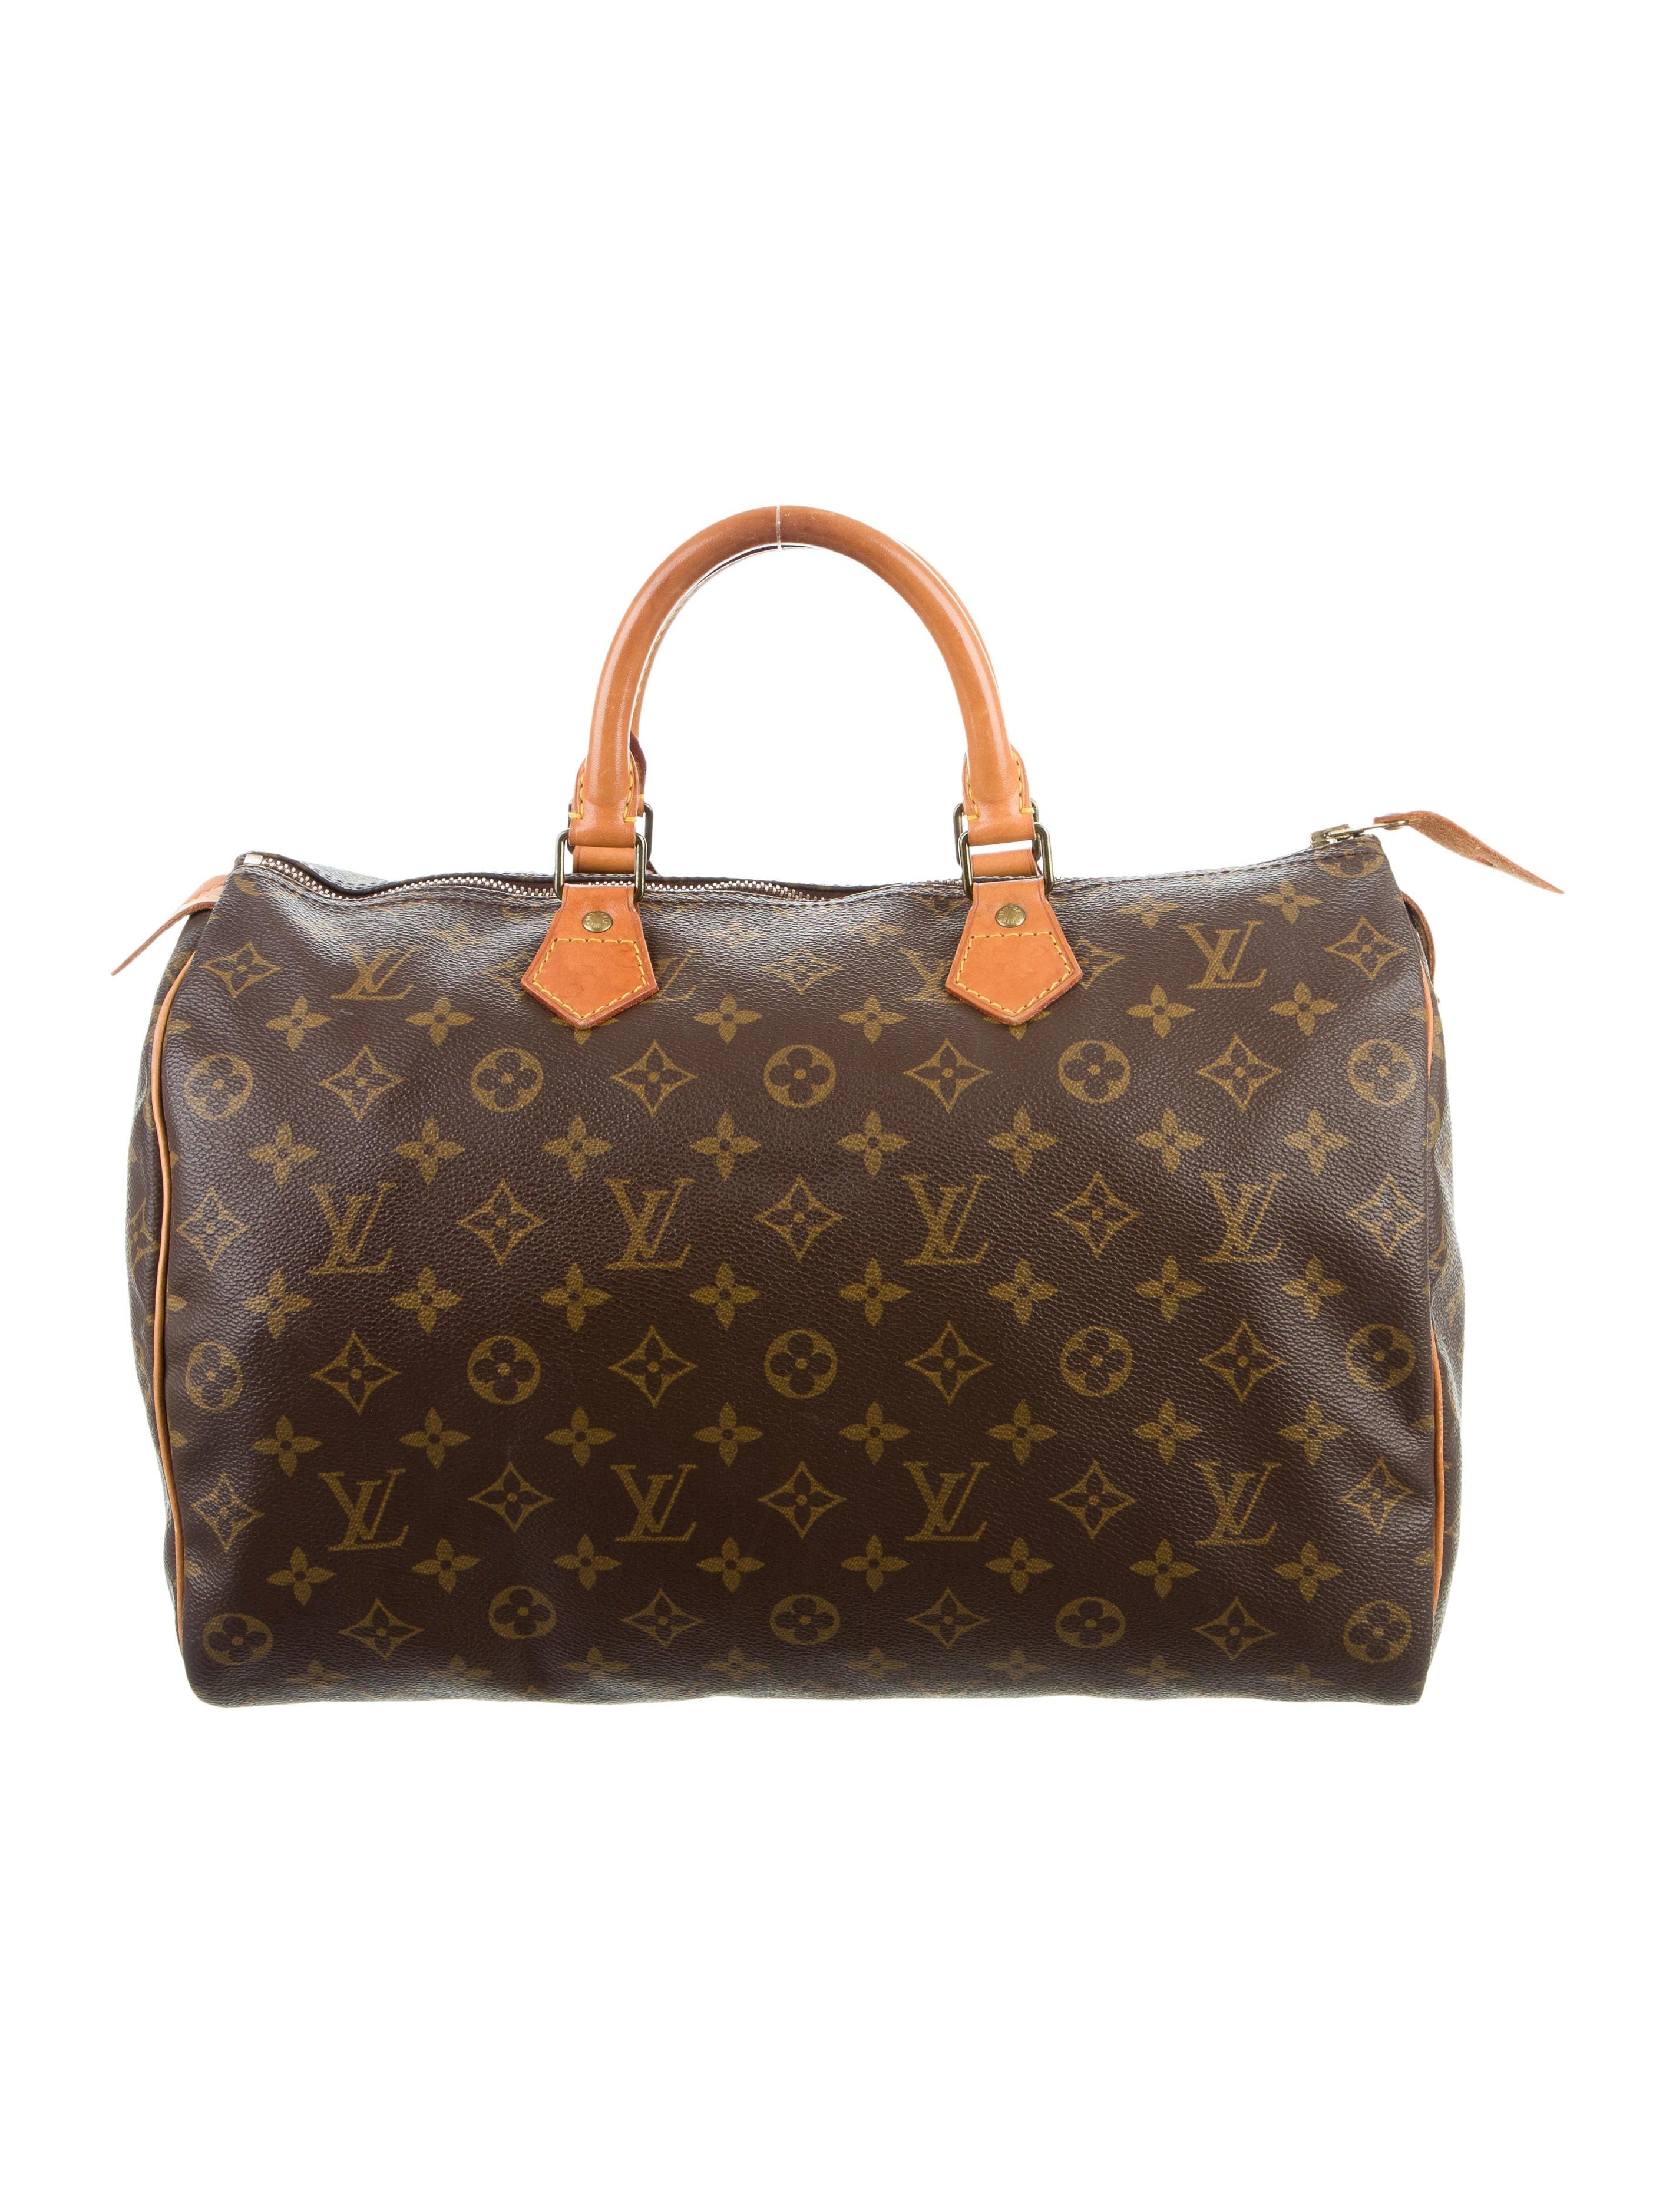 louis vuitton monogram speedy 35 handbags lou120904. Black Bedroom Furniture Sets. Home Design Ideas